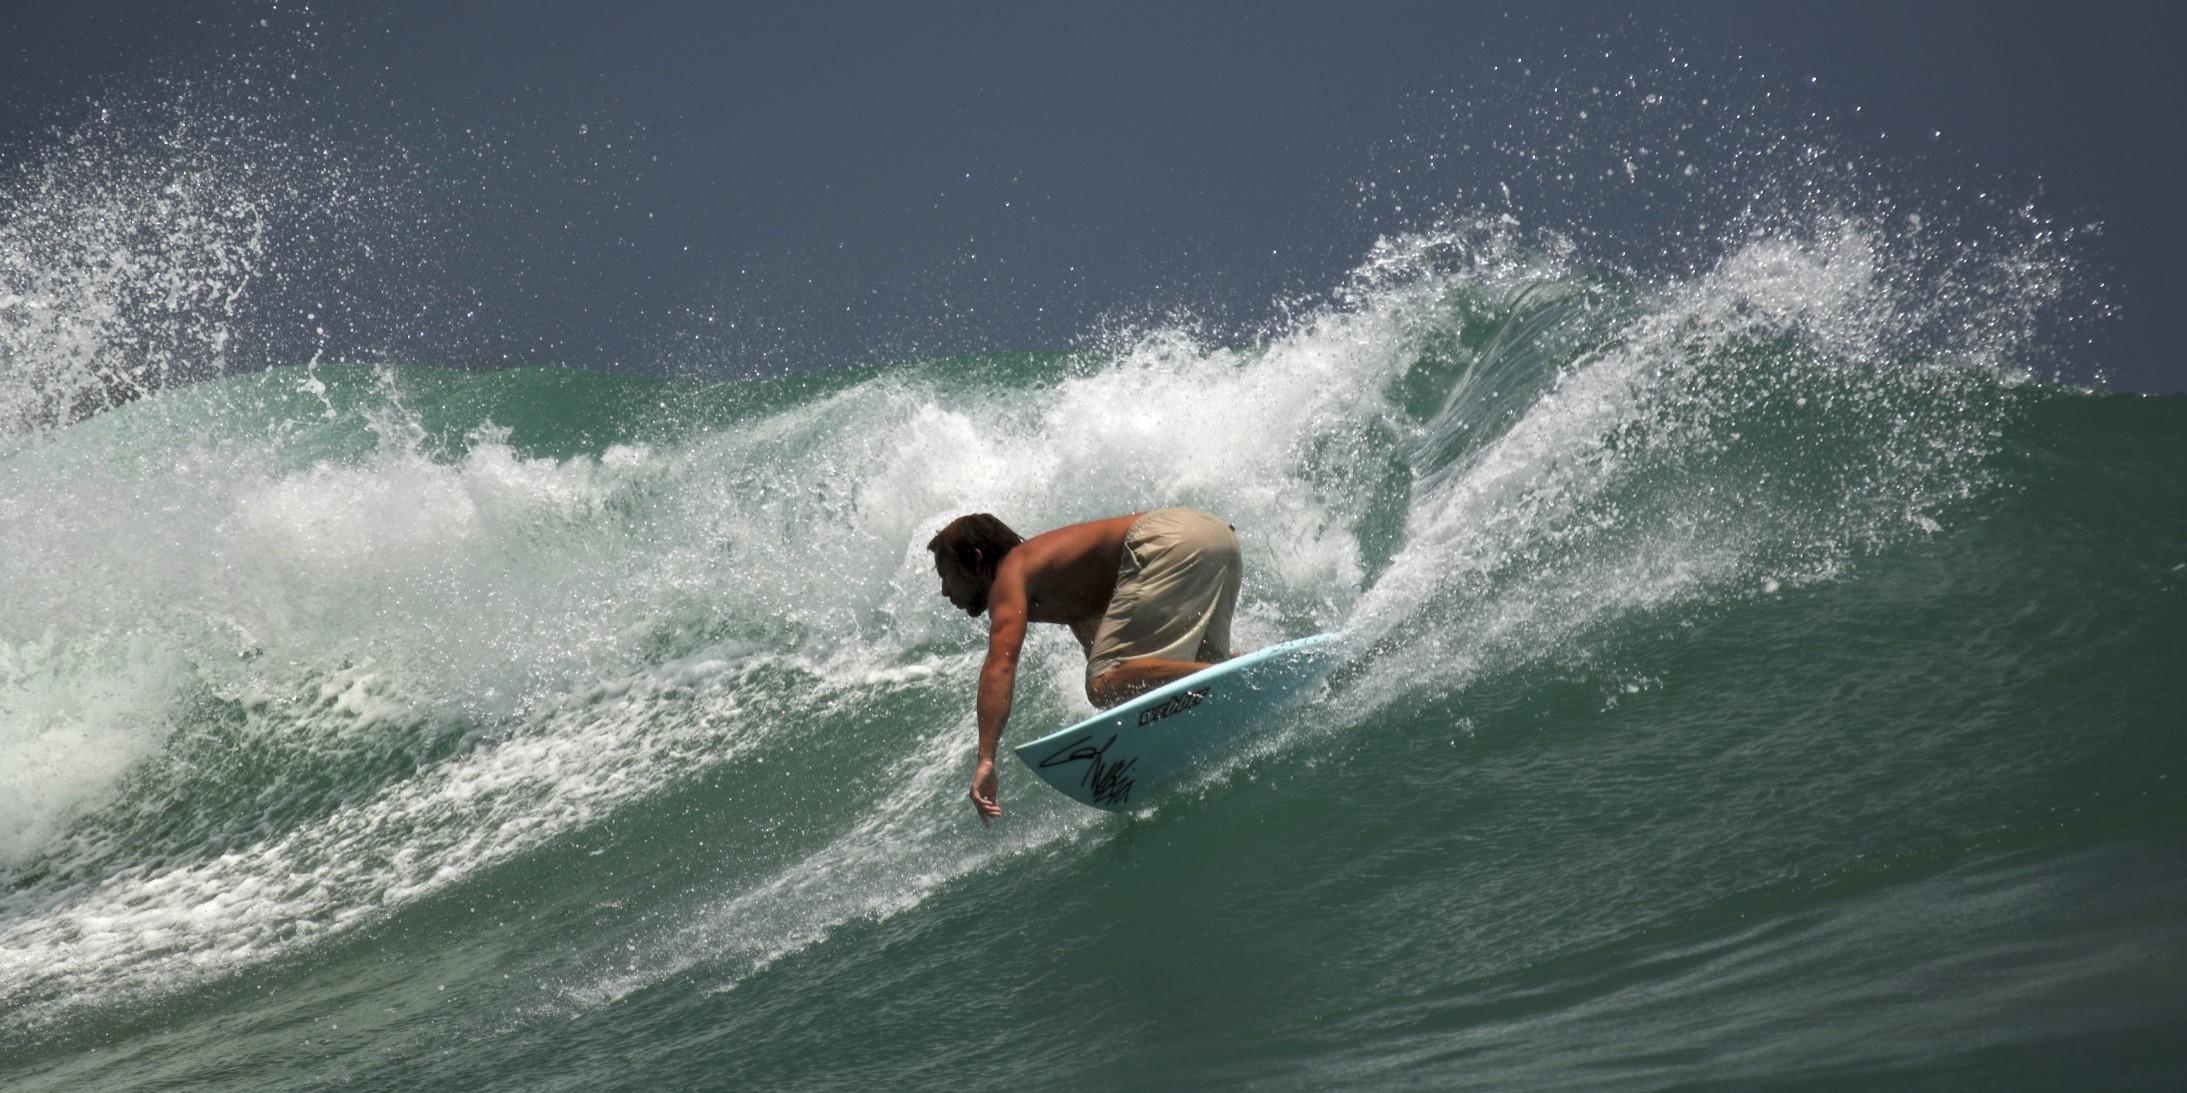 McFly_Surf_Boattrip_Indonesia_photo_Jakob_Polacsek_Auch Freerider sind Leistungssportler